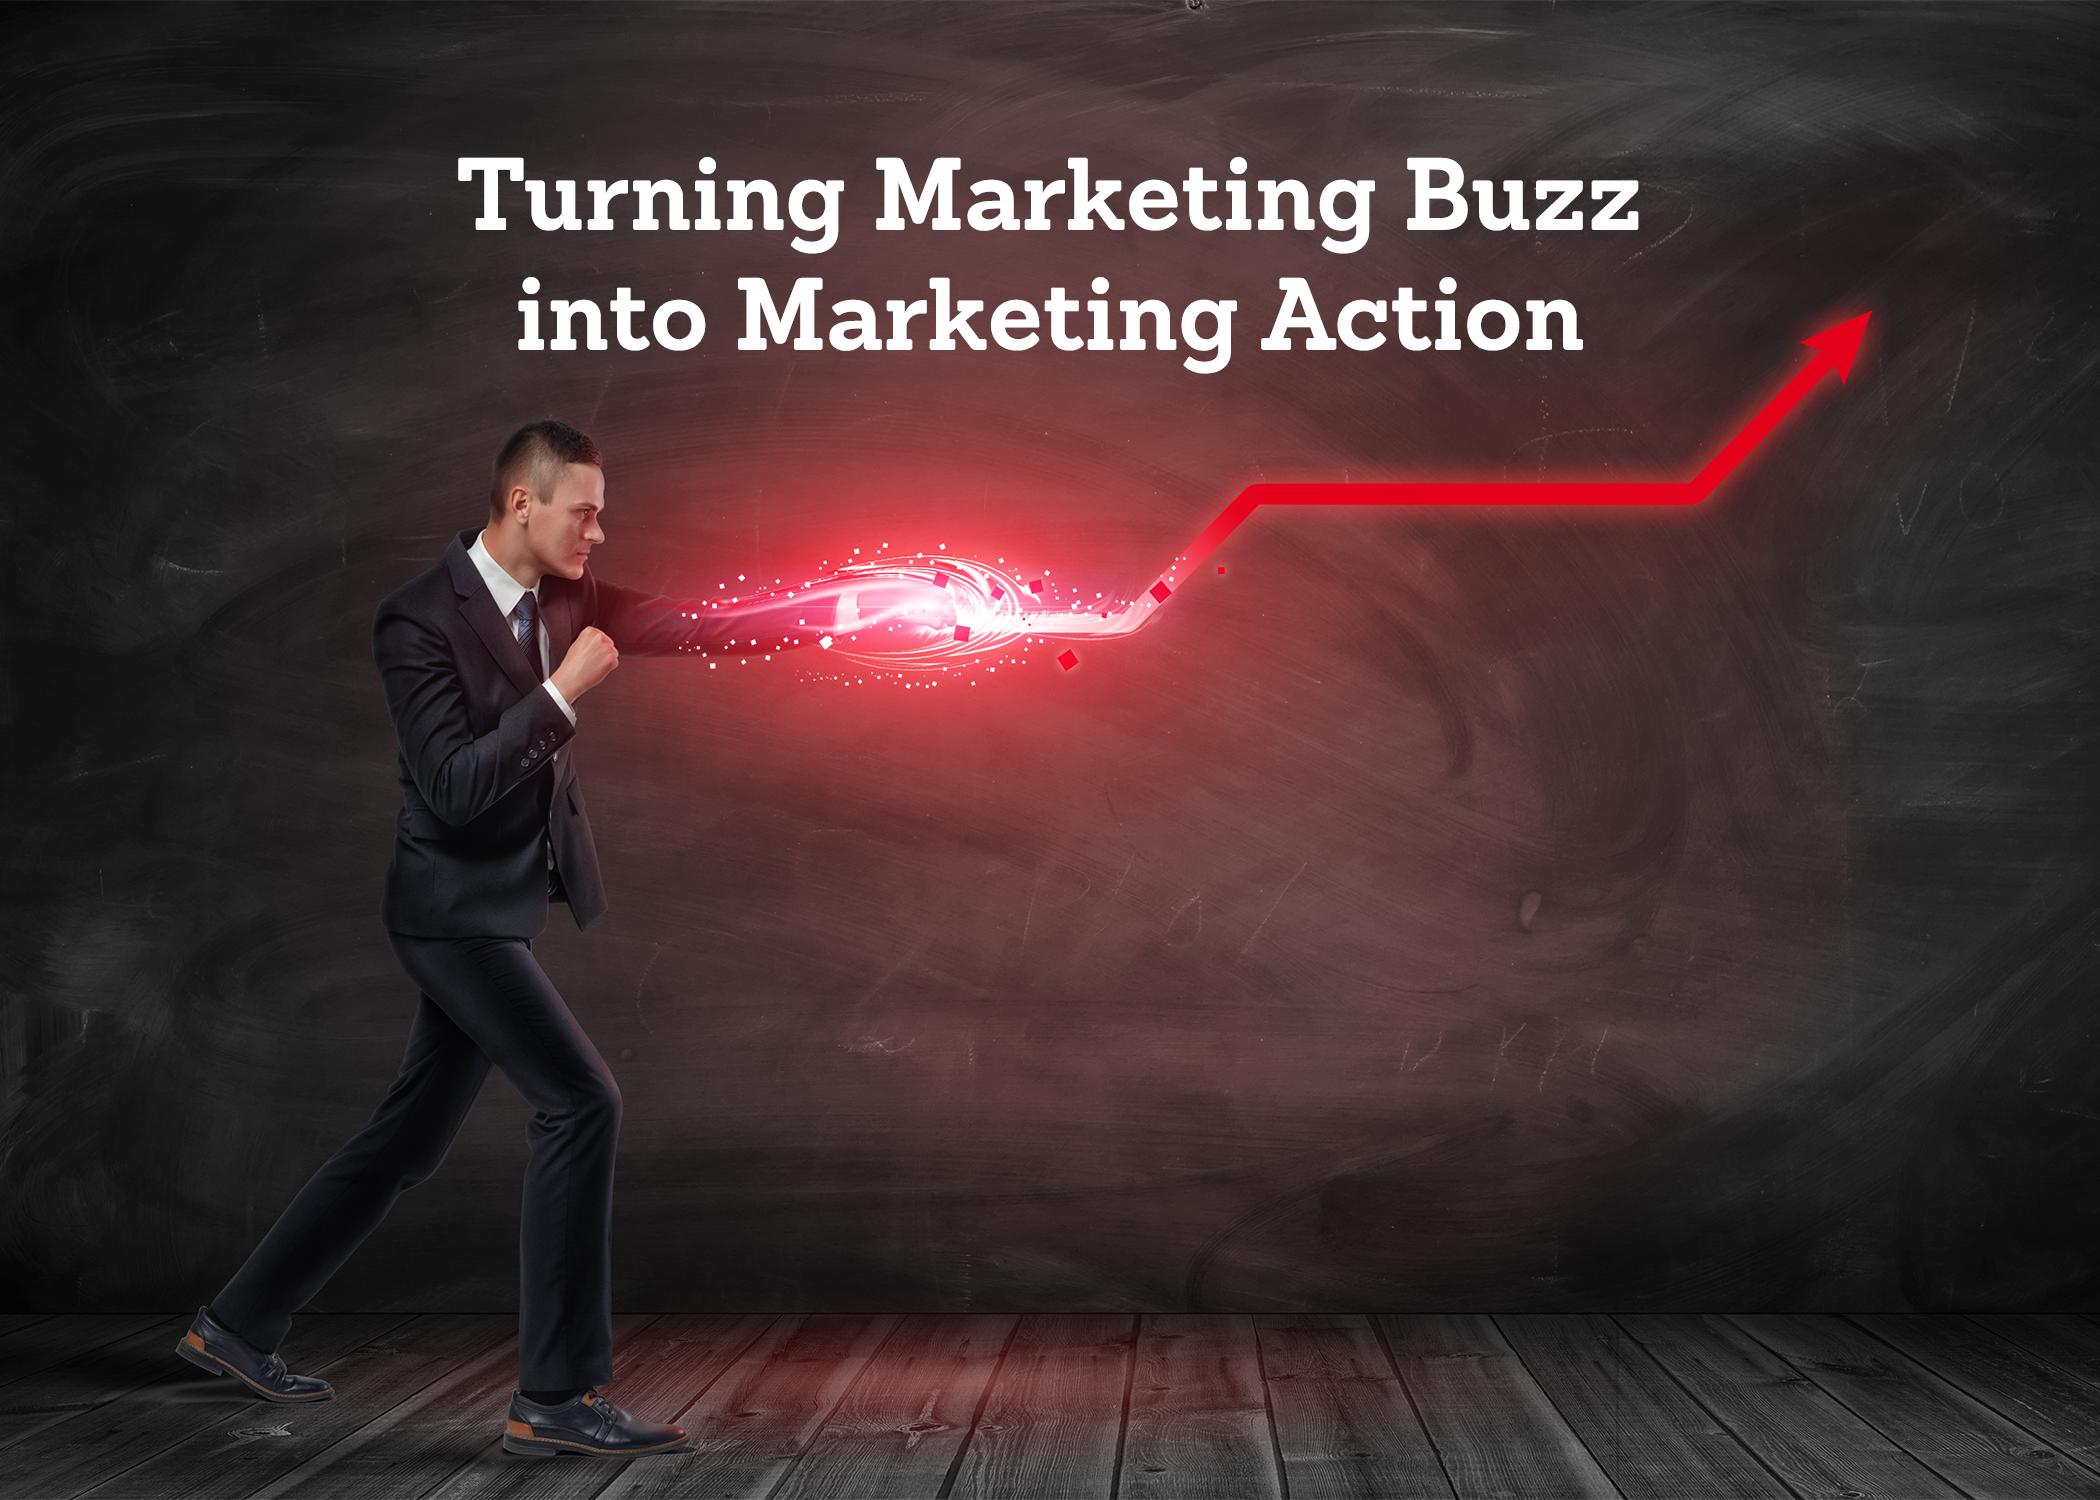 Marketing Action